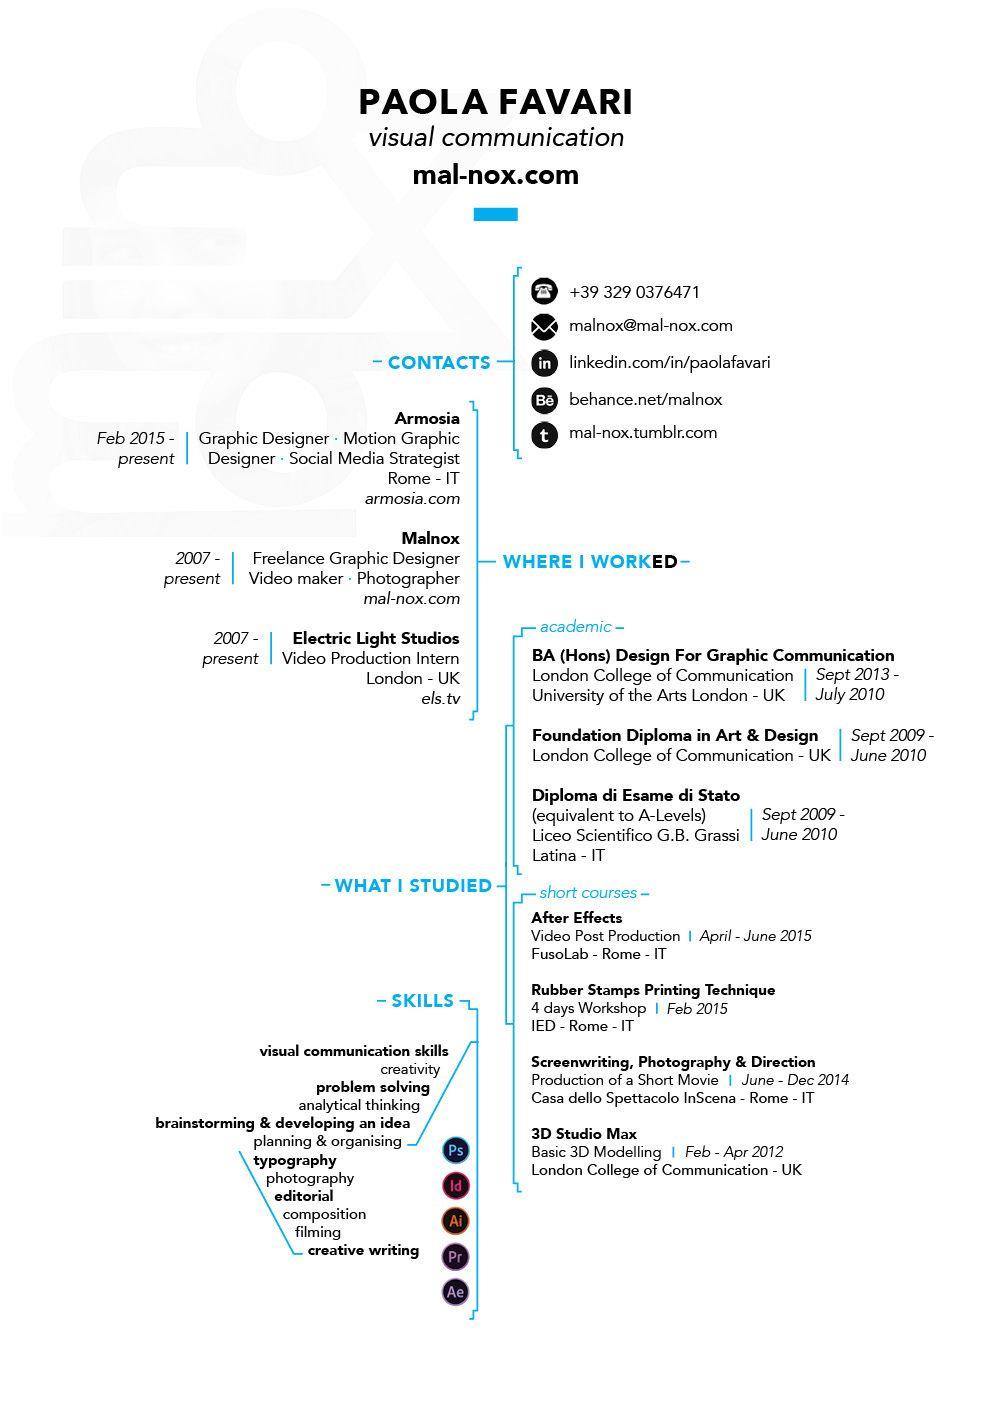 RESUME - CV - creative   creative portfolios, CVs, Resumes   Pinterest